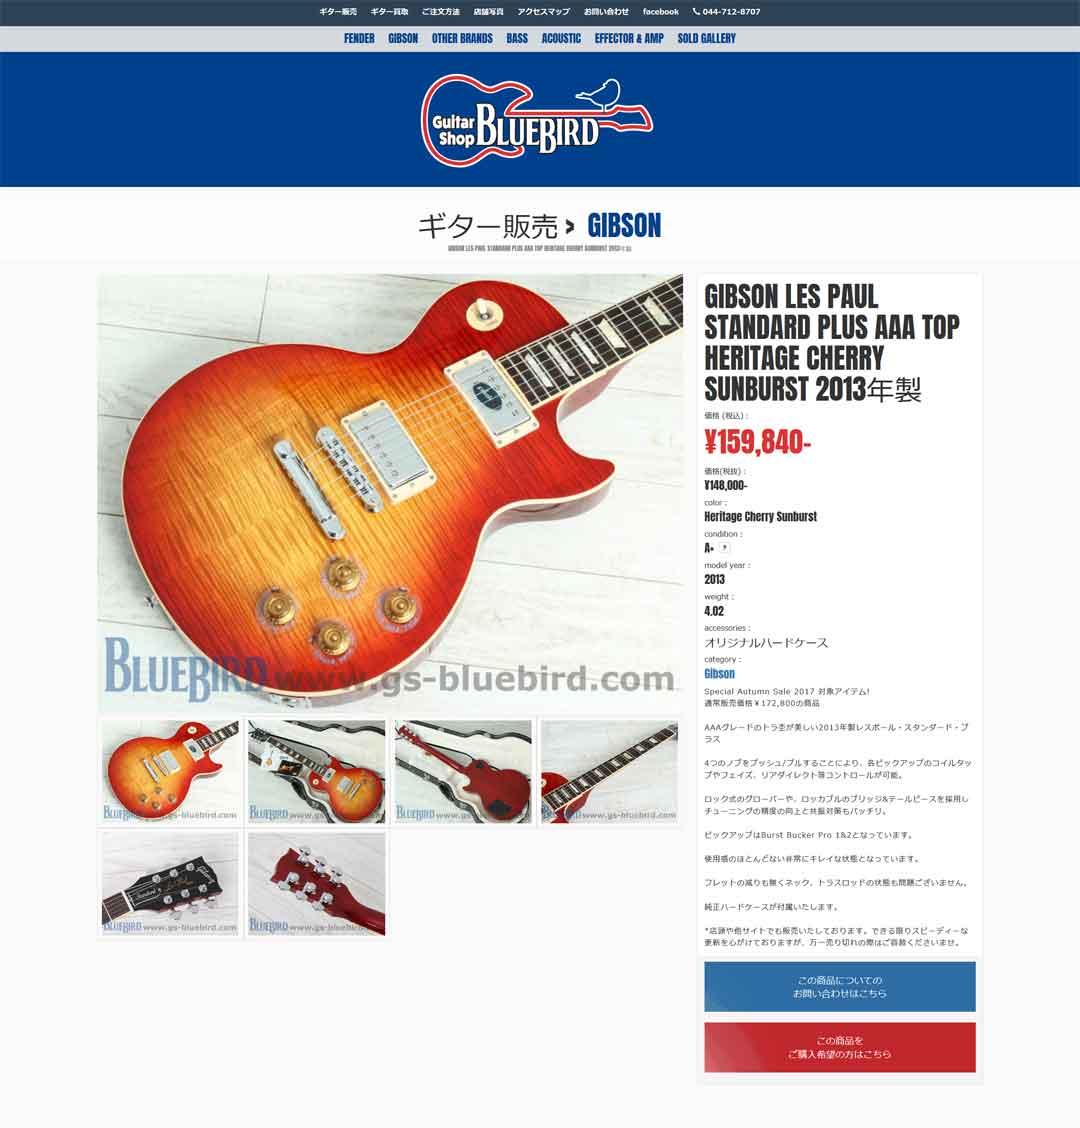 guitar shop bluebird 制作実績 Webデザイン ECサイト